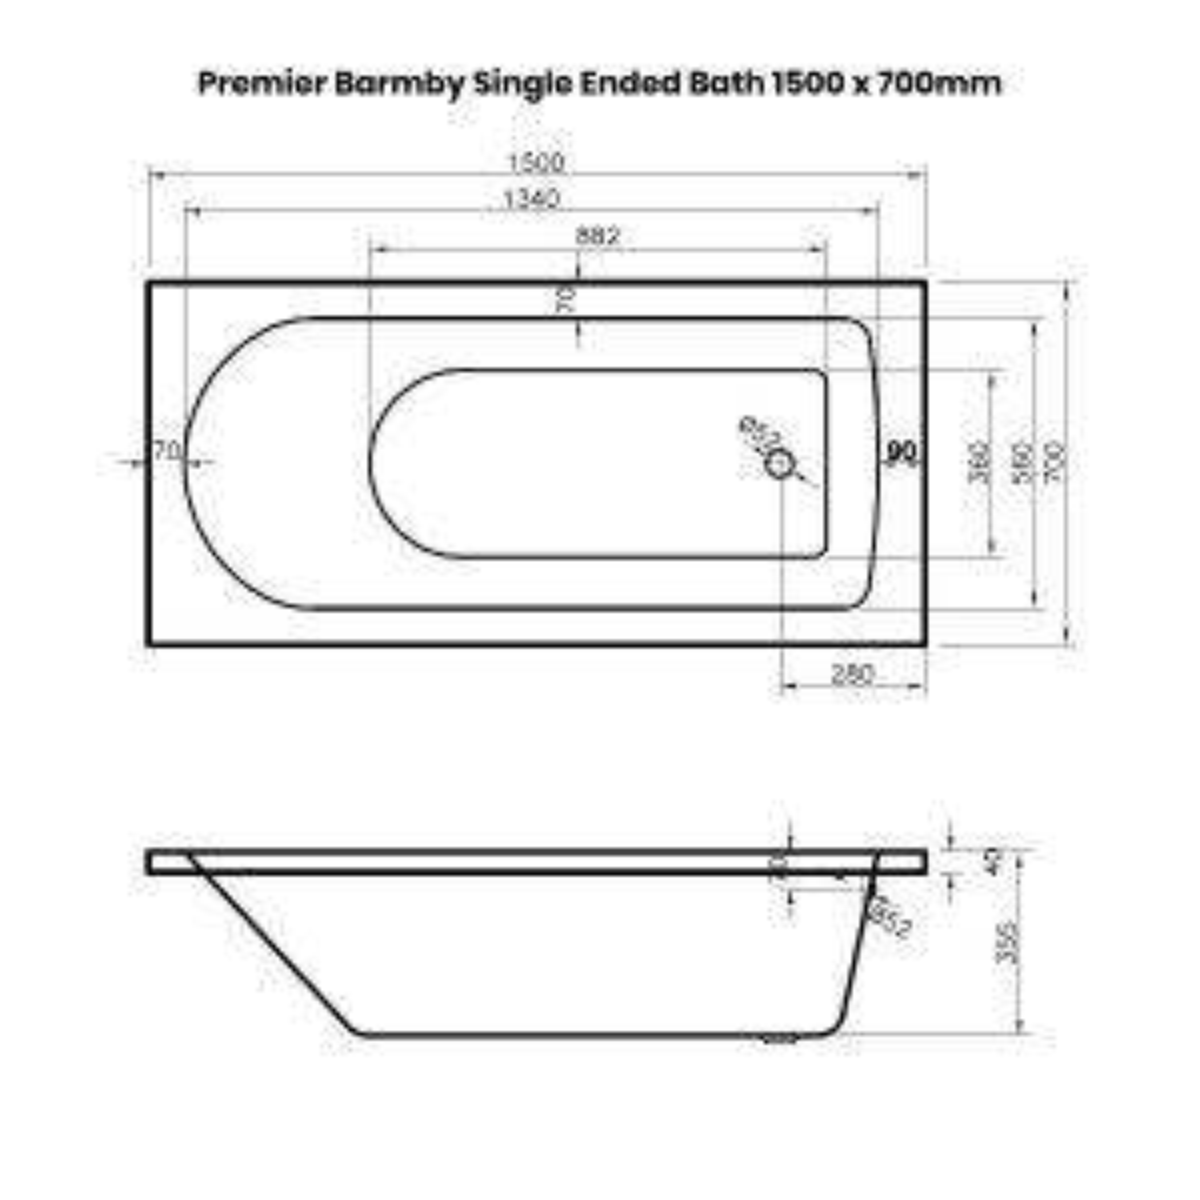 Premier Barmby Single Ended Bath 1500 x 700mm Dimensions